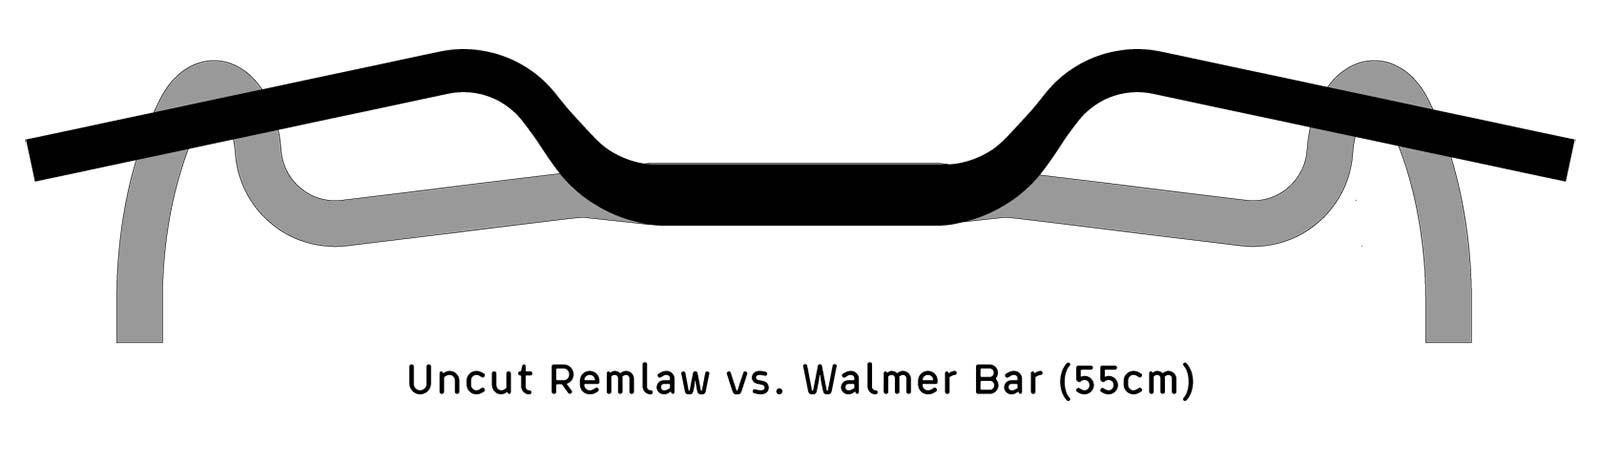 Curve Remlaw gravel adventure flat bar, forwardswept & backswept MTB bikepacking bar vs. Walmer dropbar